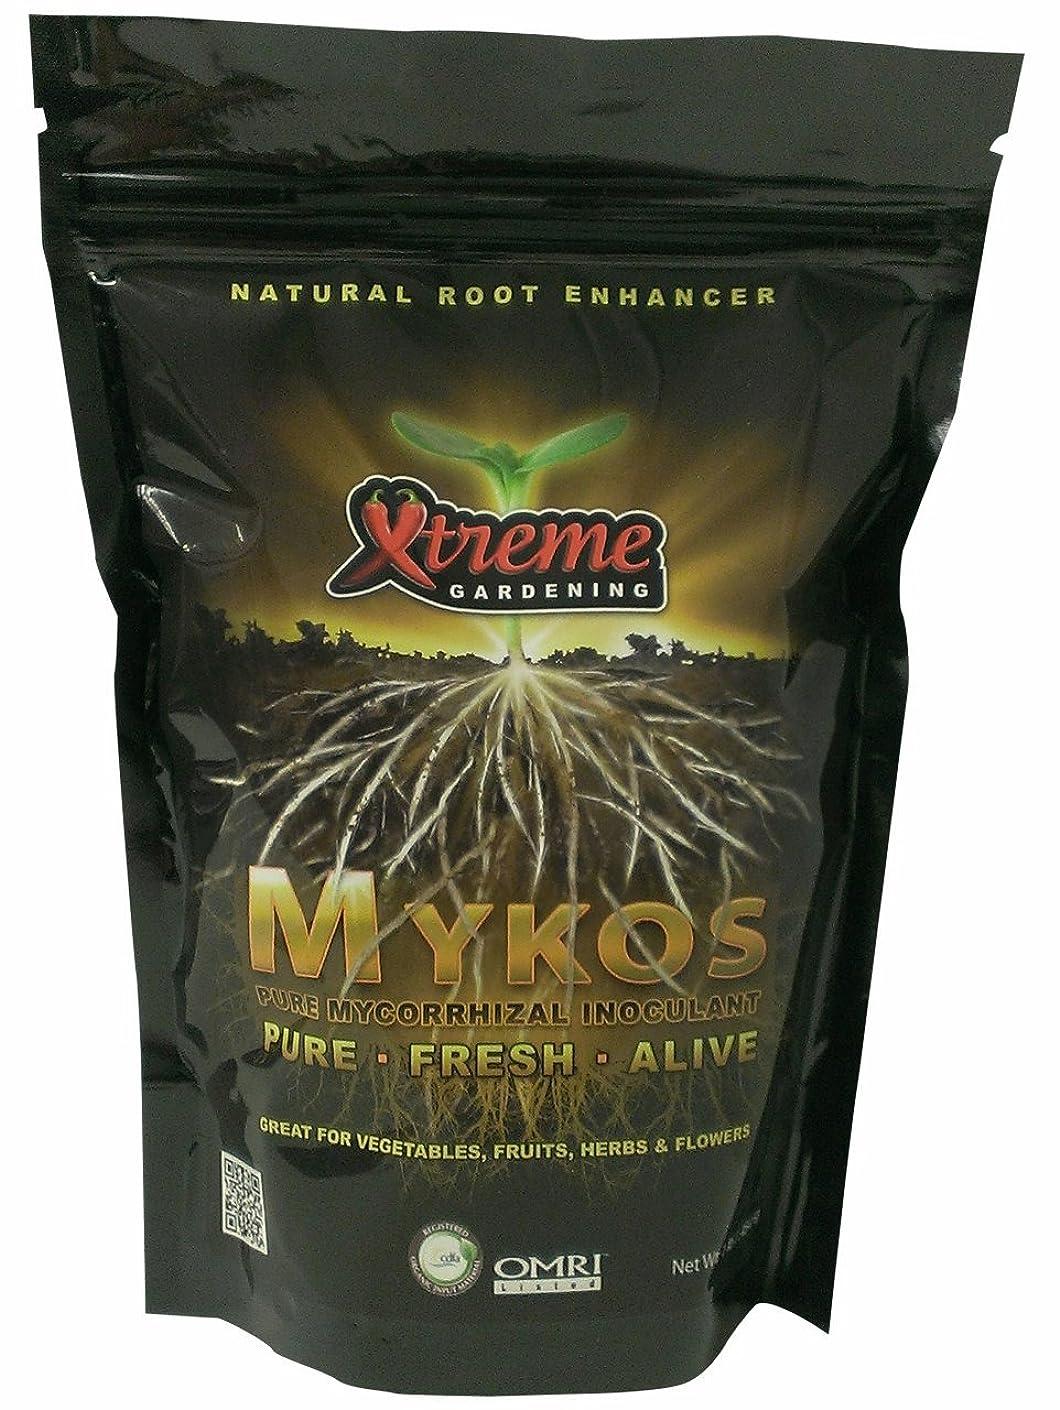 Xtreme Gardening RTI RT4402 Mykos, 2.2-Pound Bag